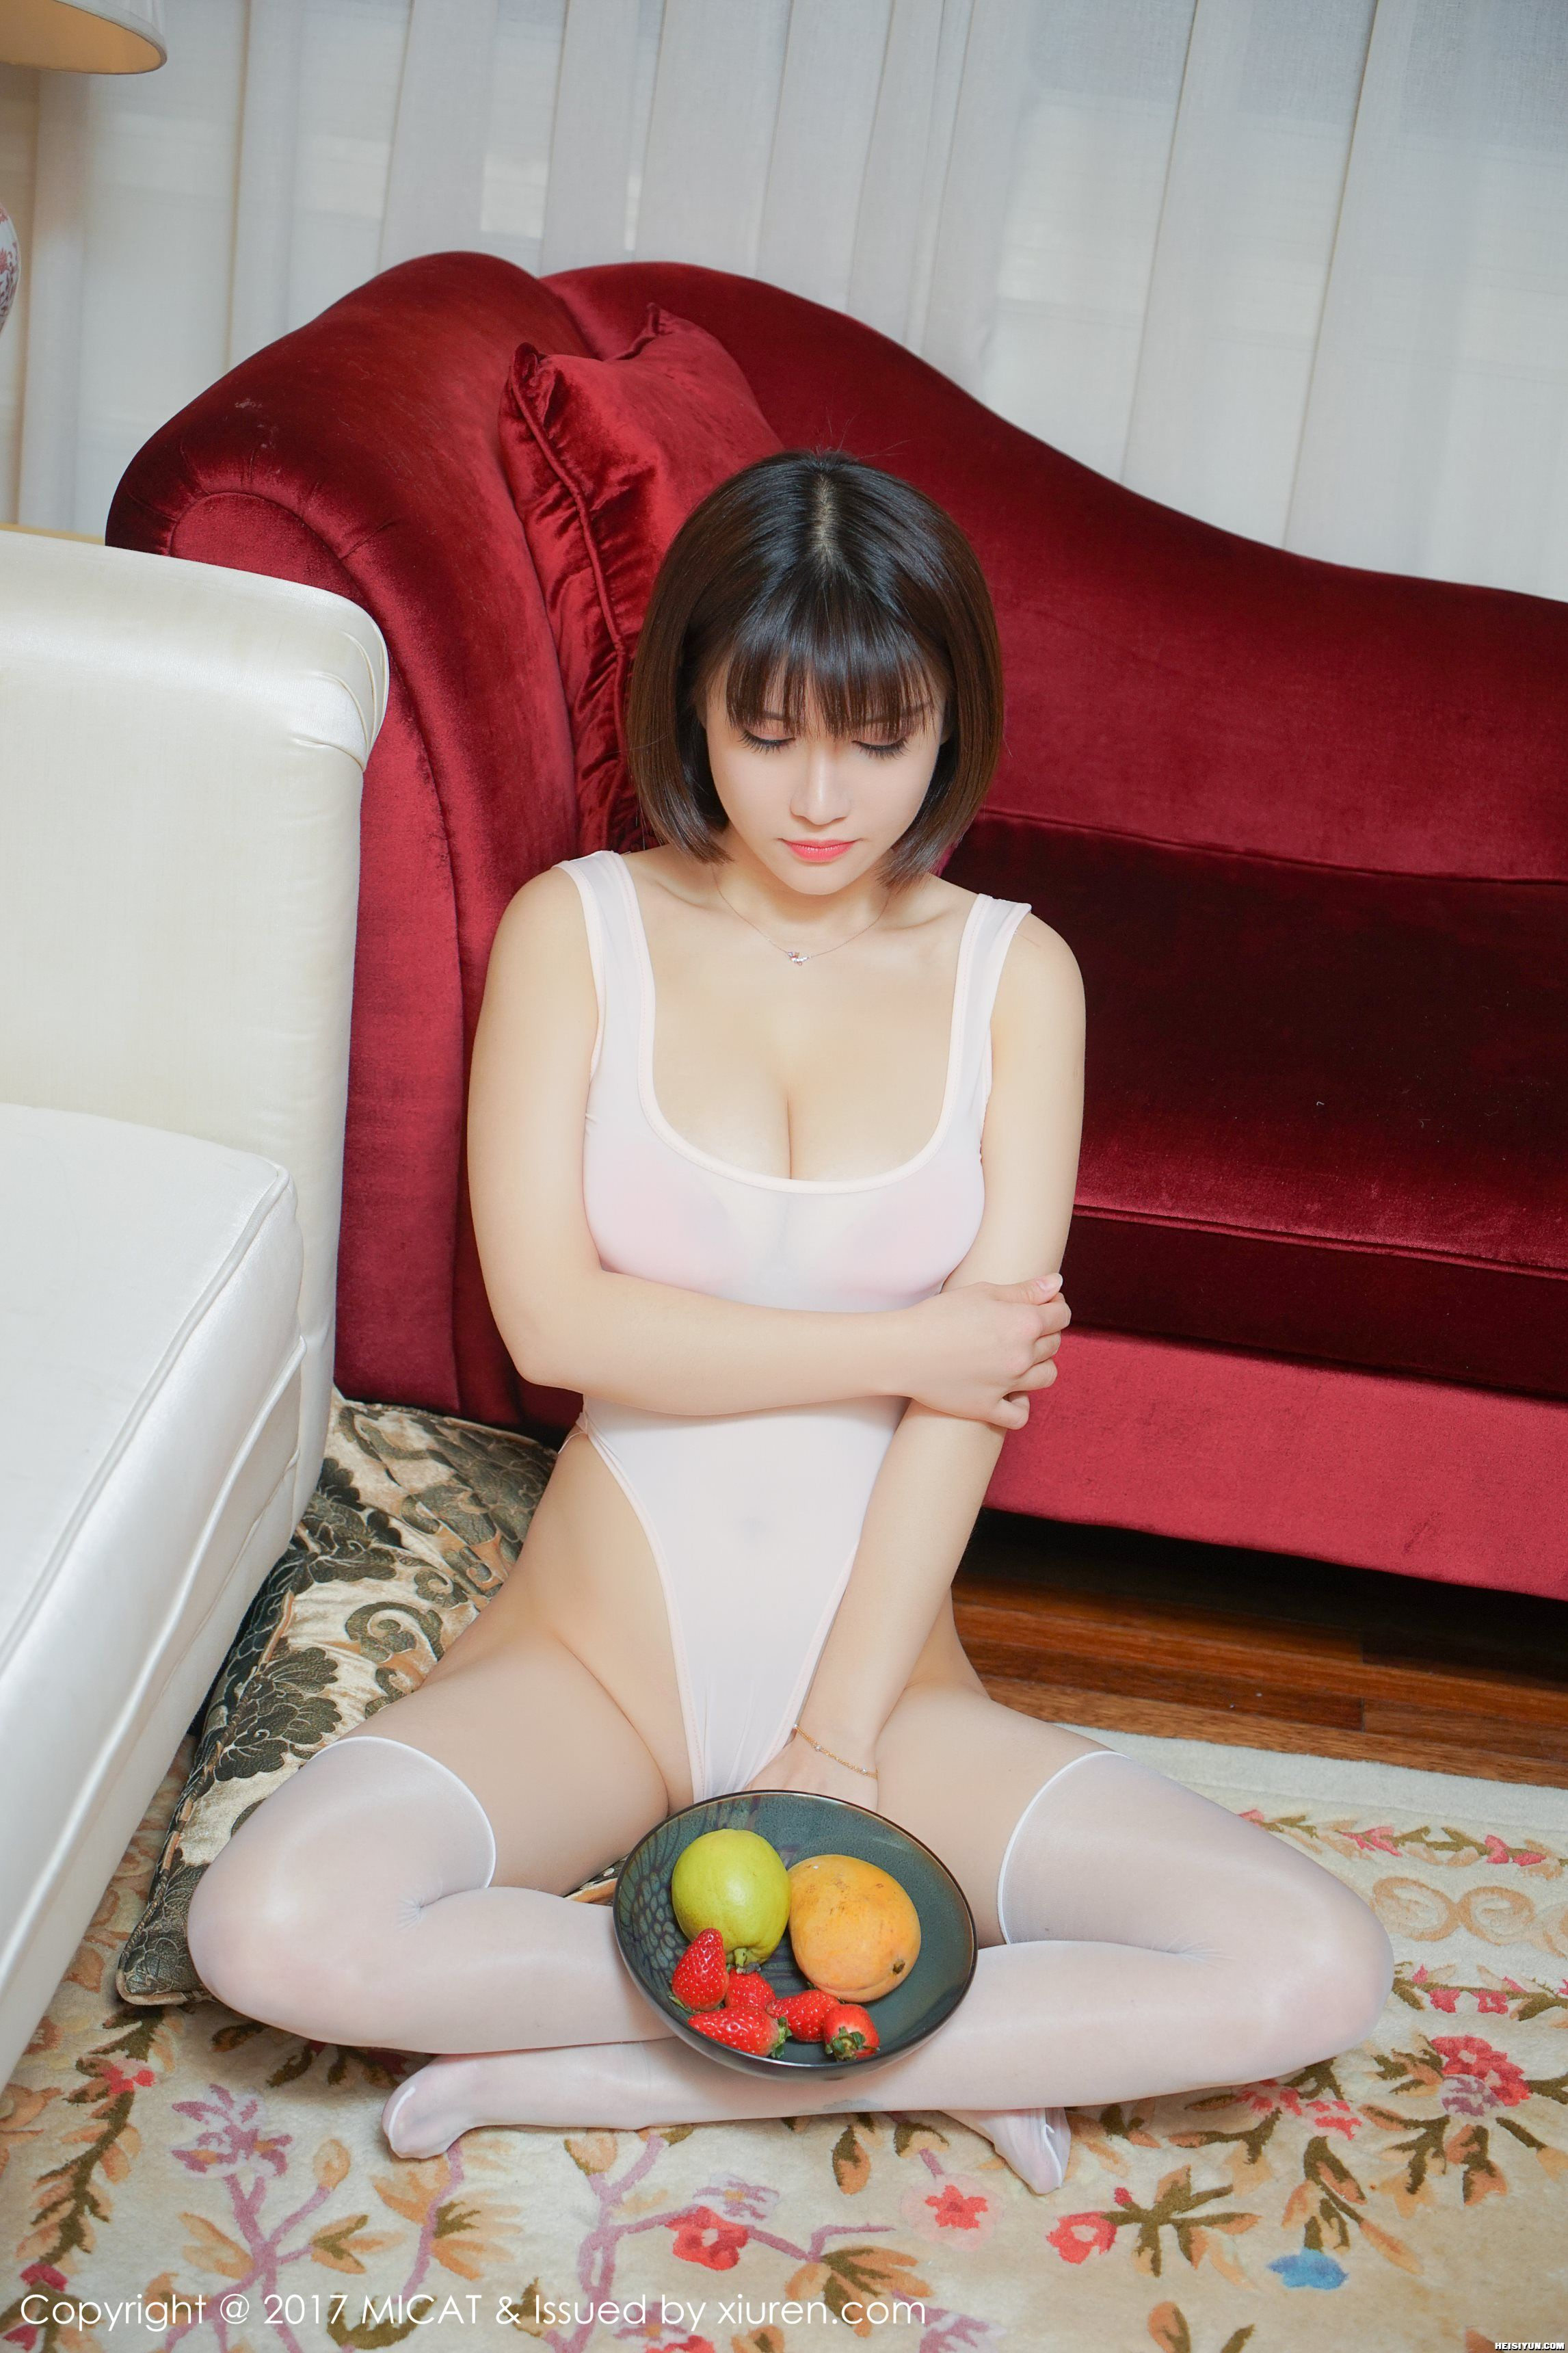 [MICAT猫萌榜] 2017.07.04 Vol.017 K8傲娇萌萌Vivian [62+1P]